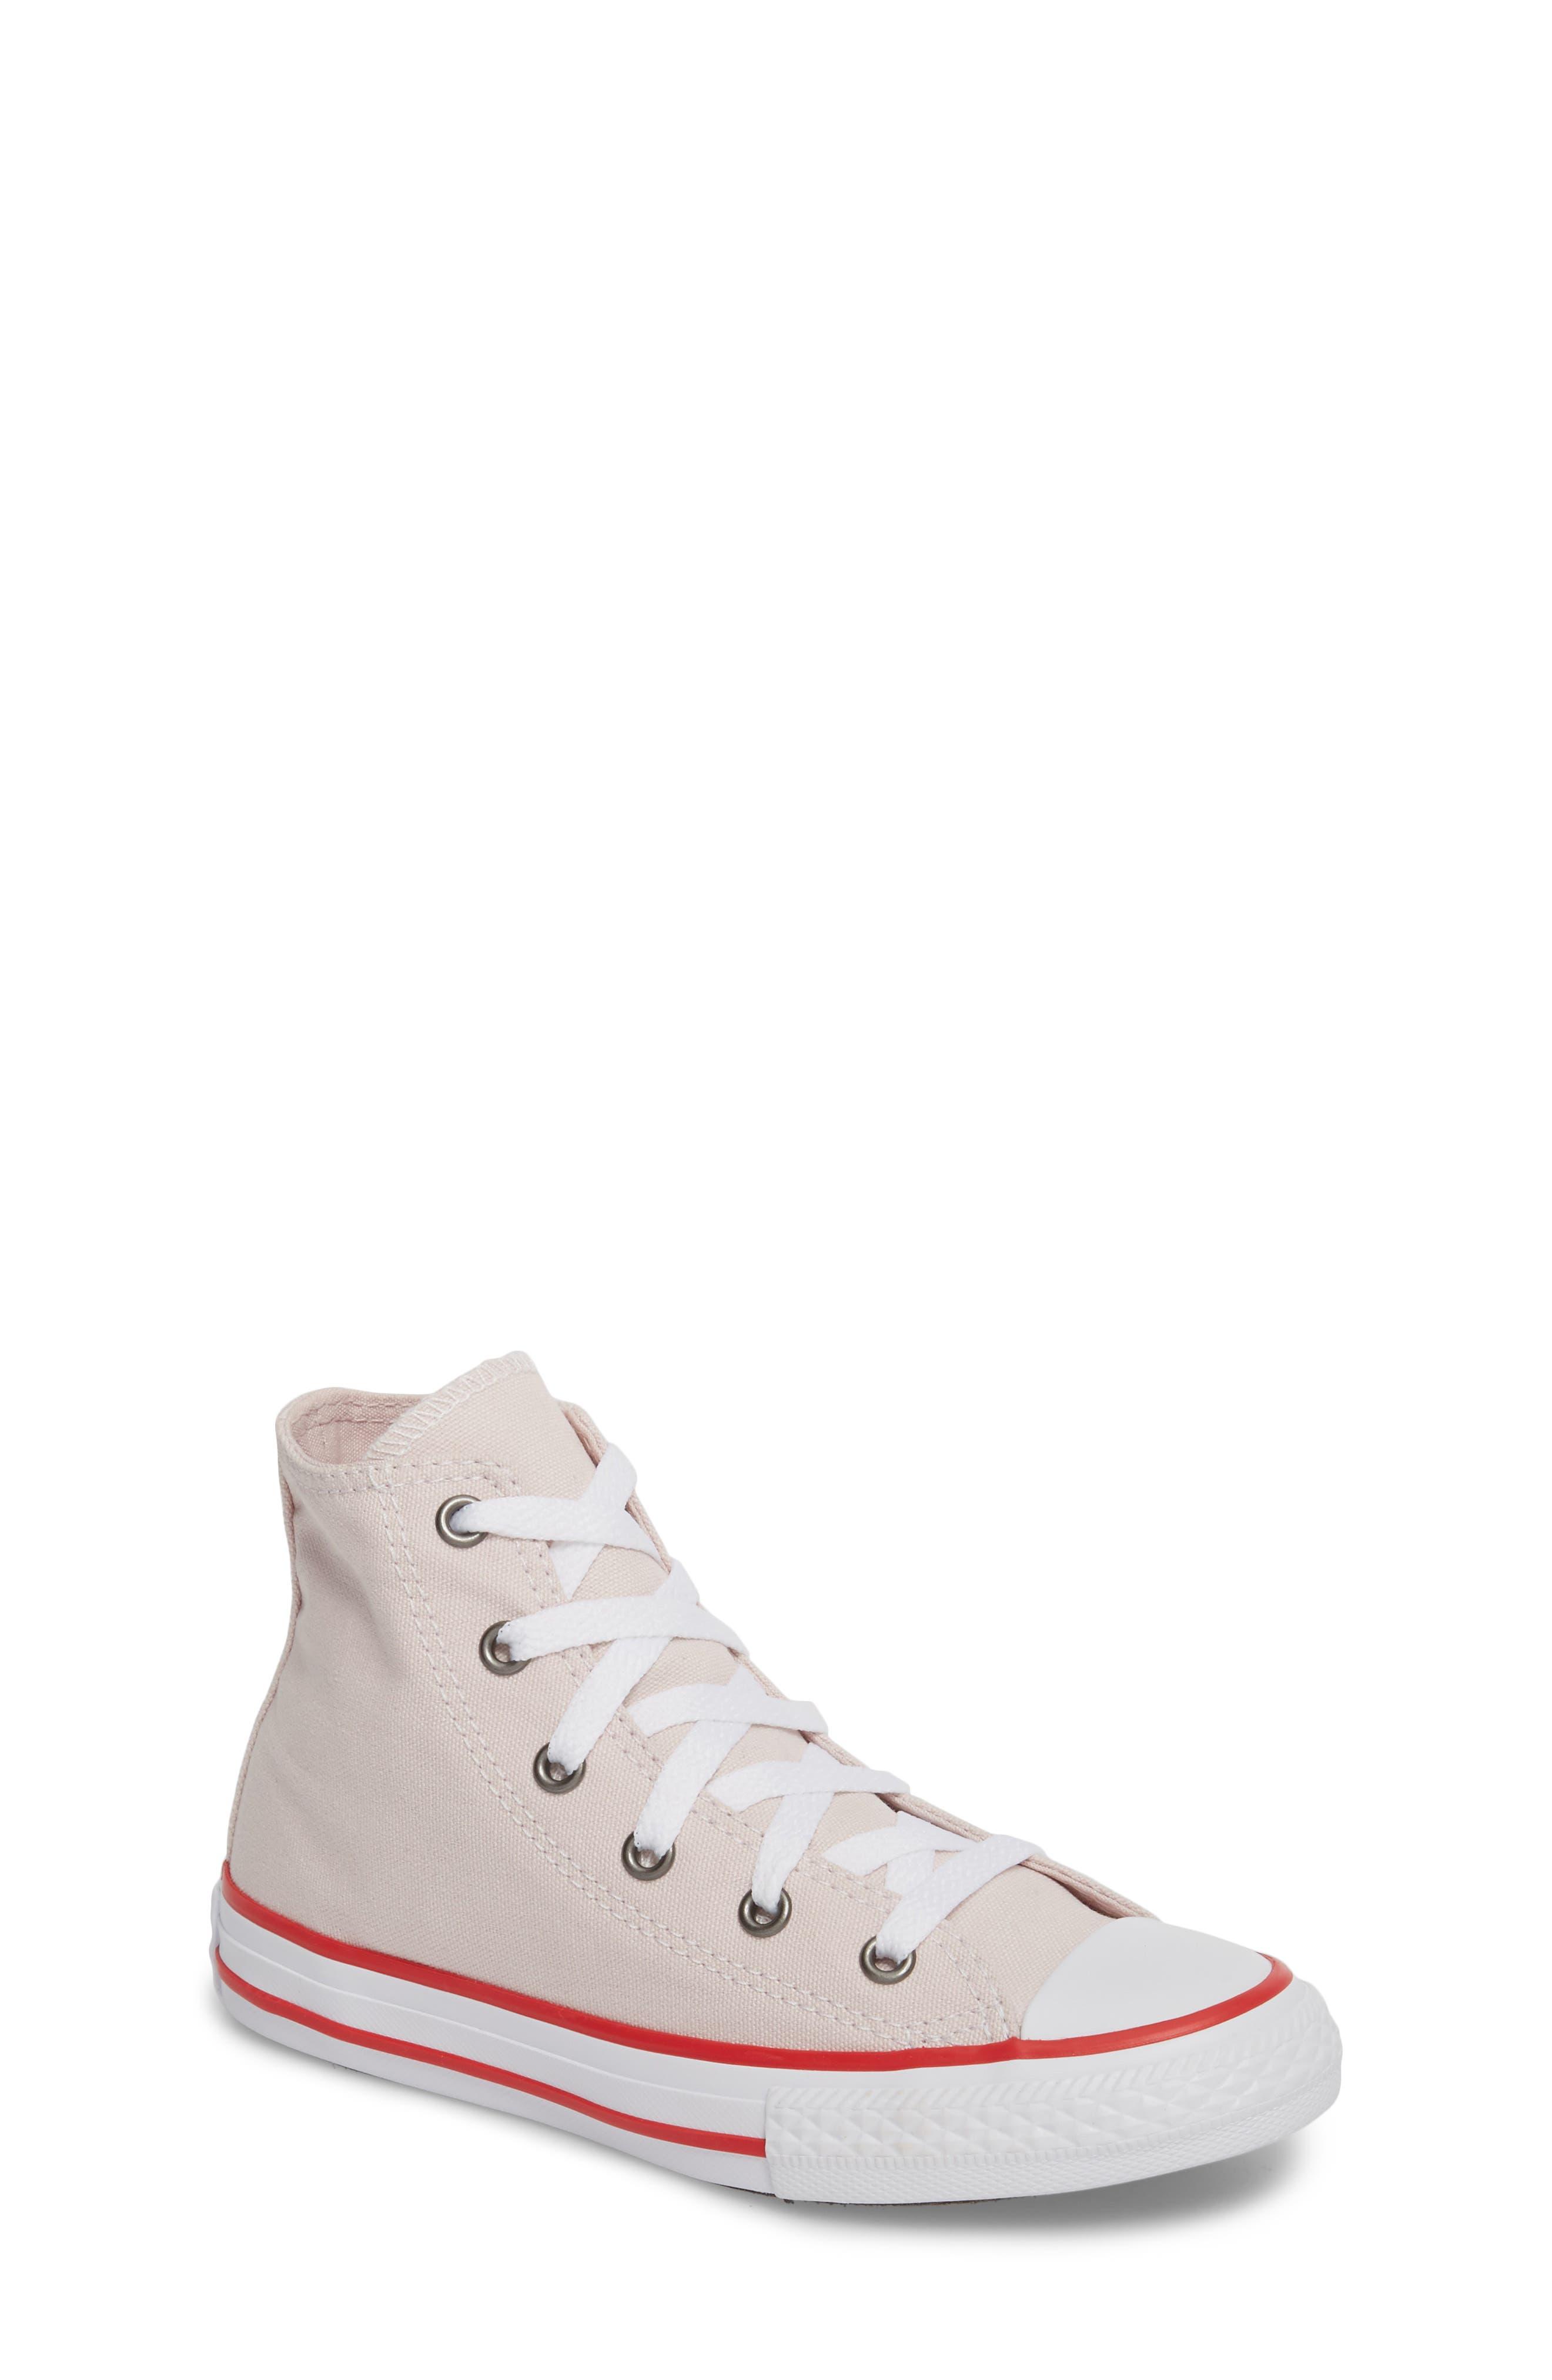 Chuck Taylor<sup>®</sup> All Star<sup>®</sup> High Top Sneaker,                             Main thumbnail 3, color,